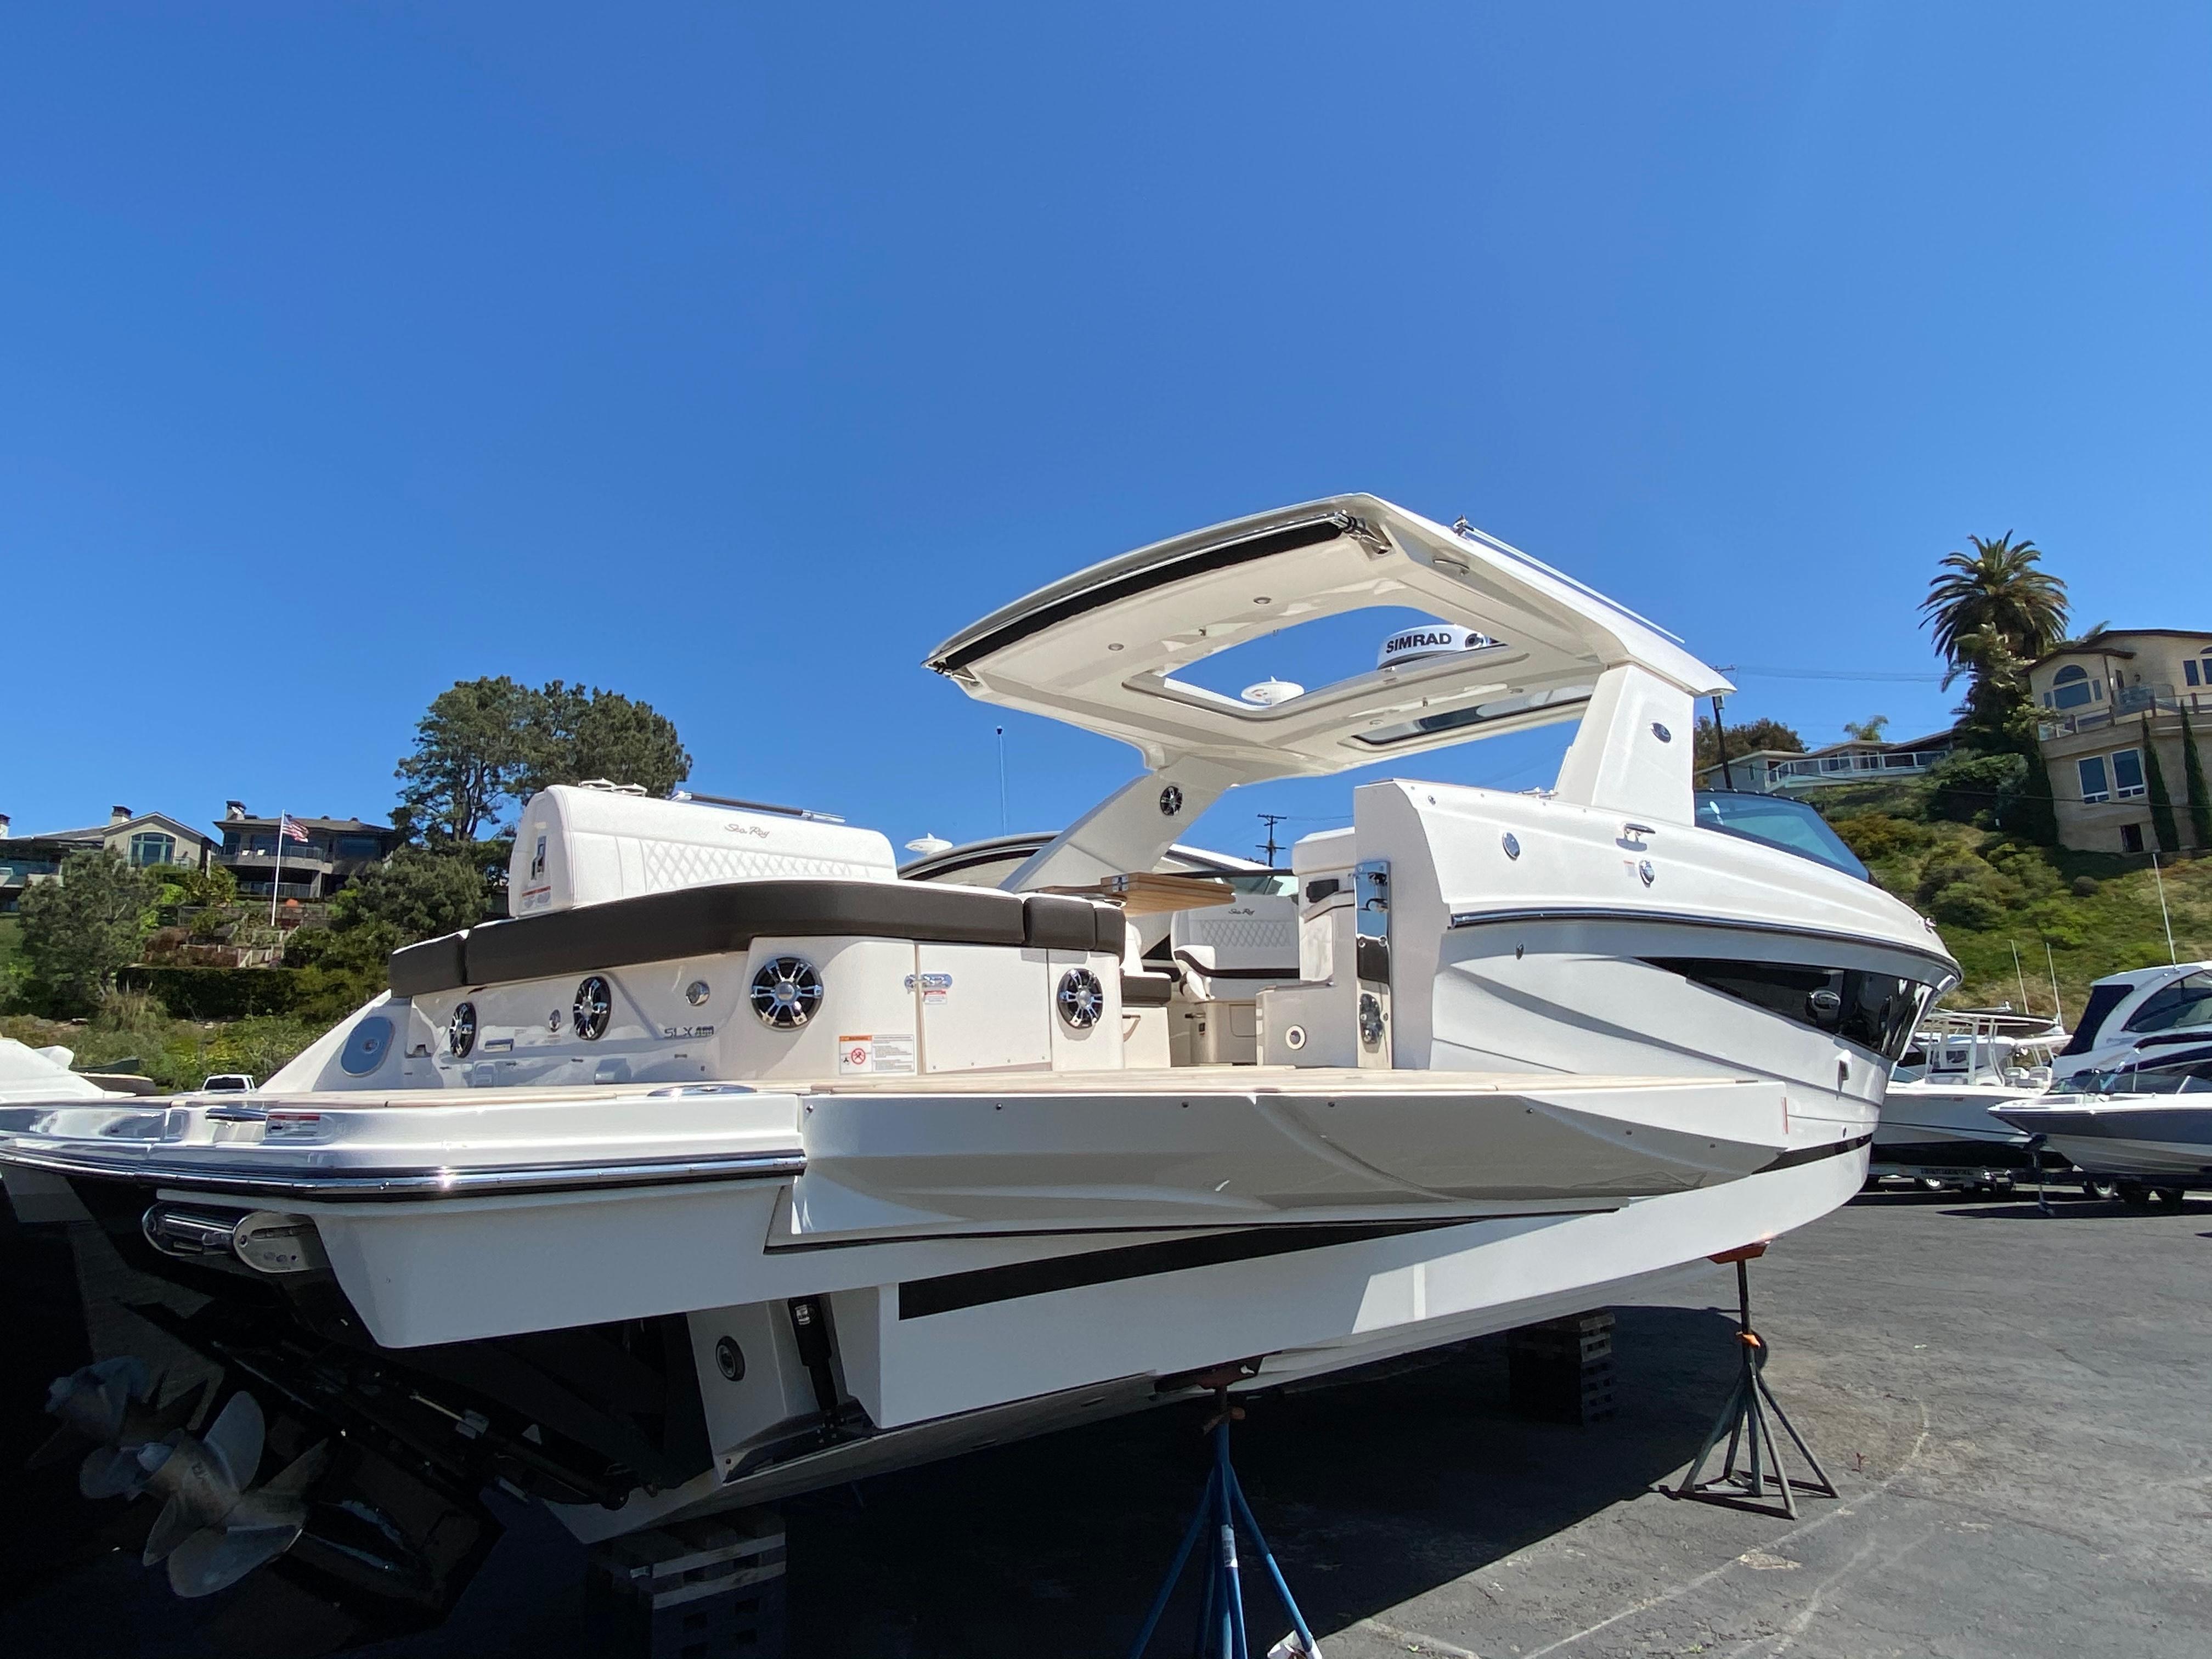 2020 Sea Ray SLX 400 #S1501J inventory image at Sun Country Coastal in Newport Beach